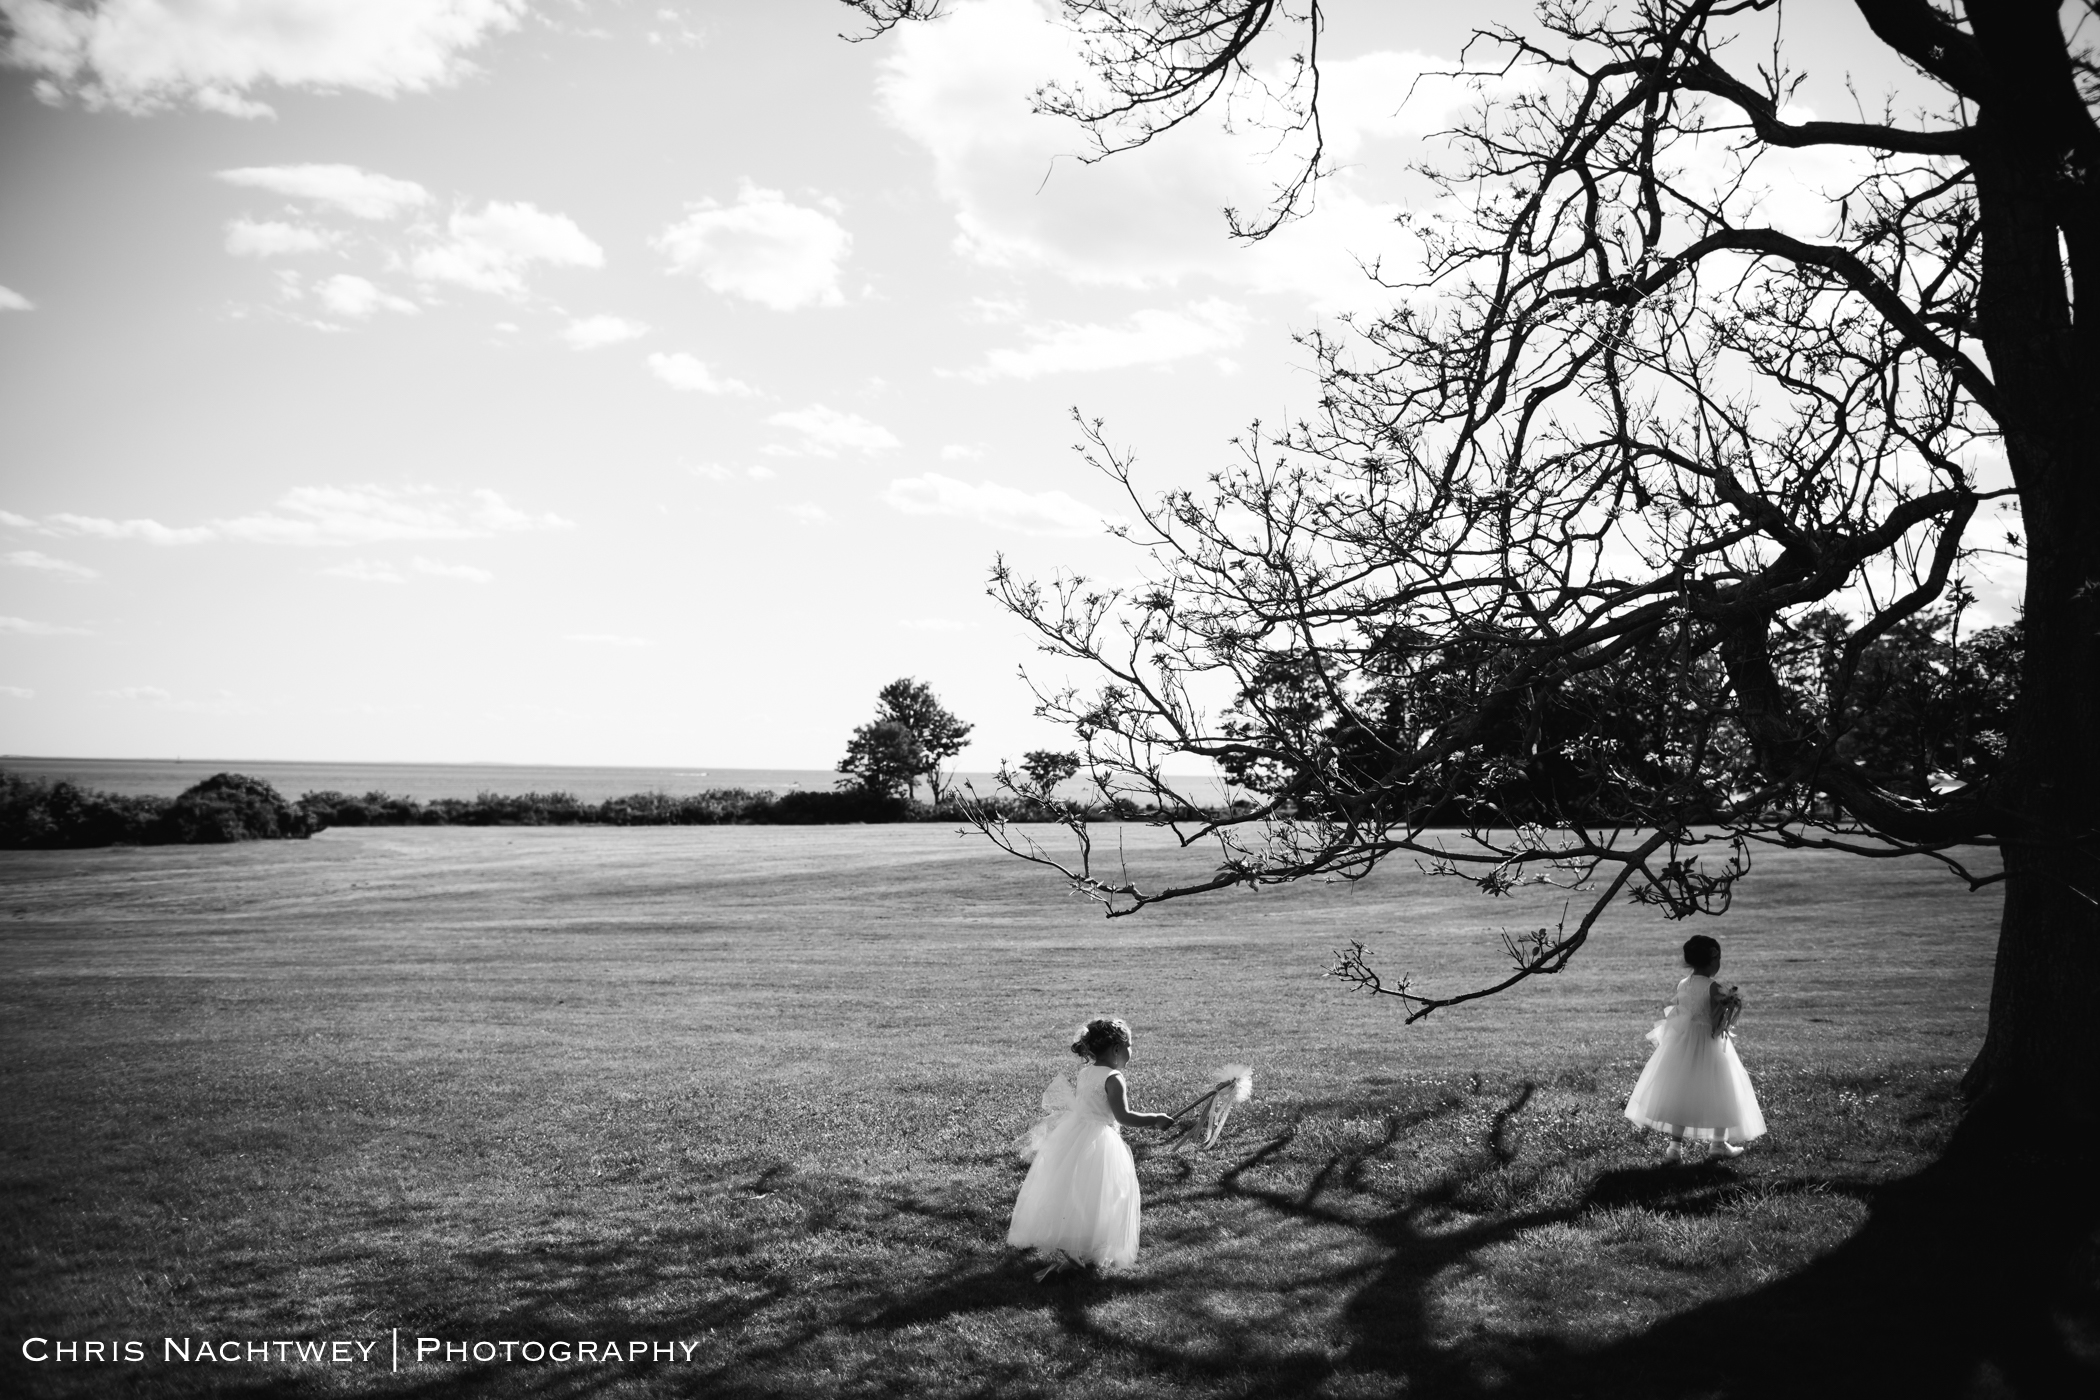 artistic-ct-wedding-photographers-chris-nachtwey-2017-94.jpg